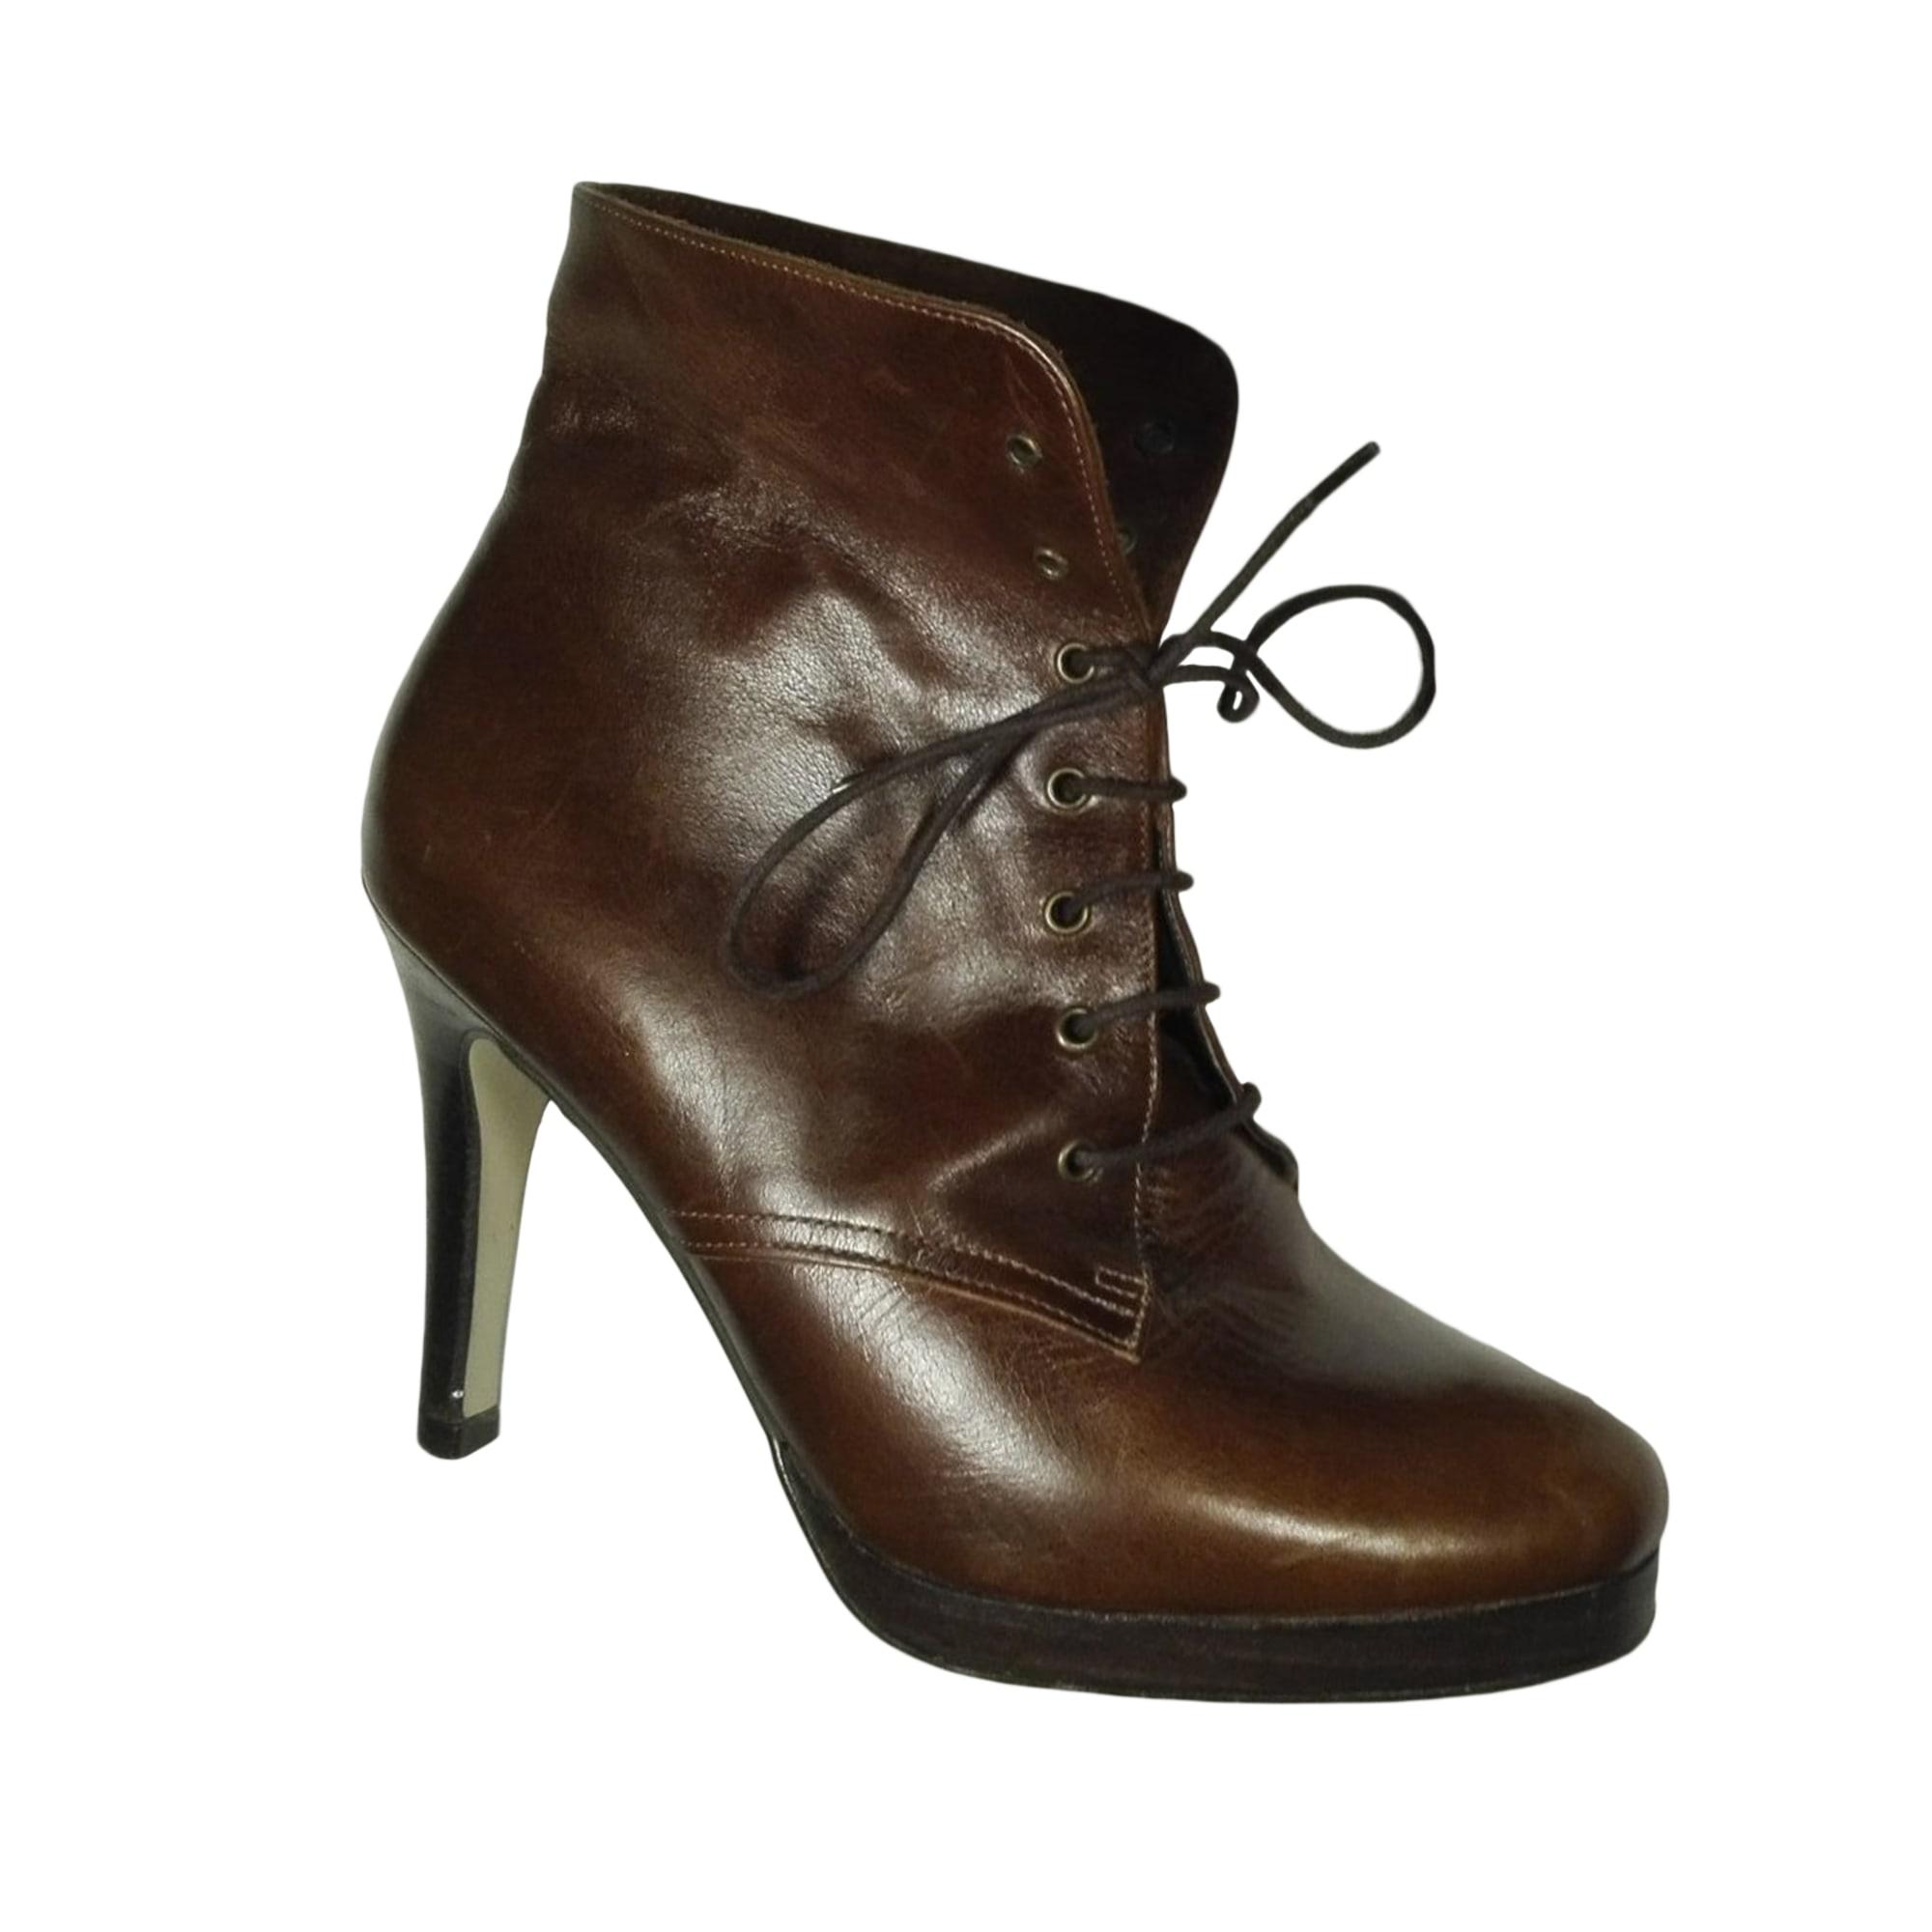 High Heel Ankle Boots GERARD DAREL Brown